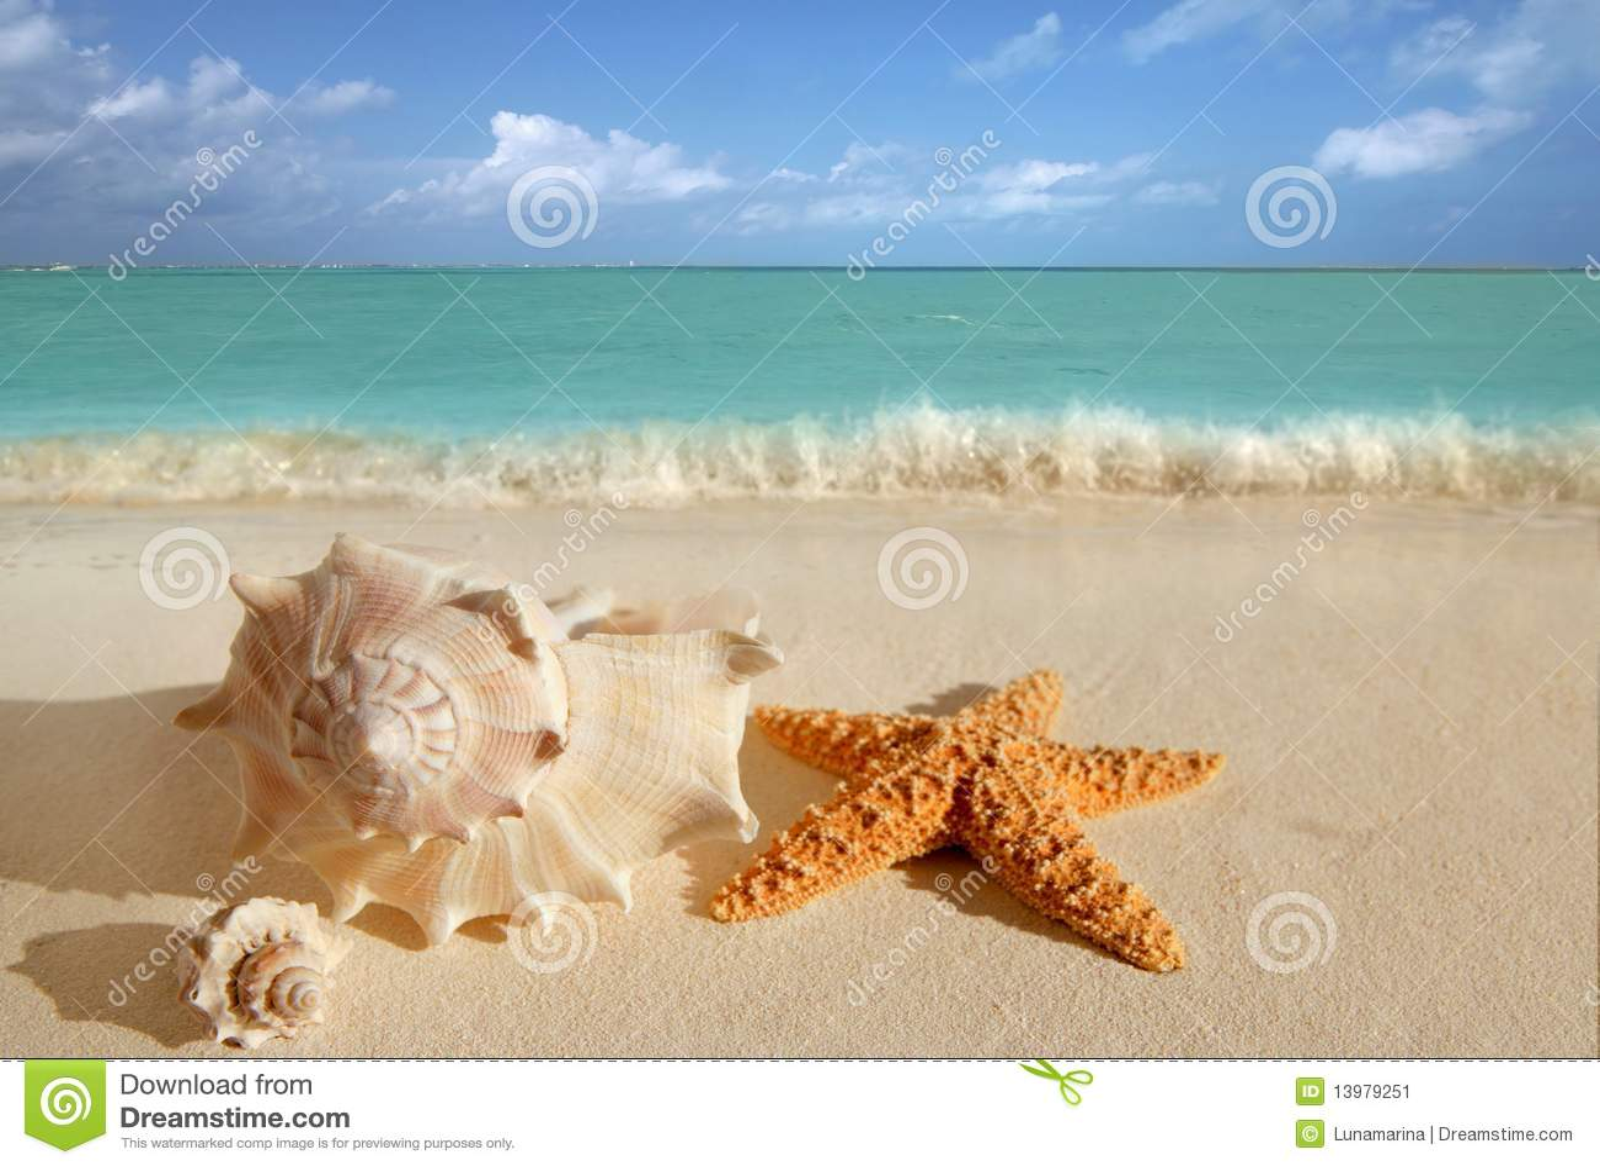 Sea shells starfish sand turquoise caribbean